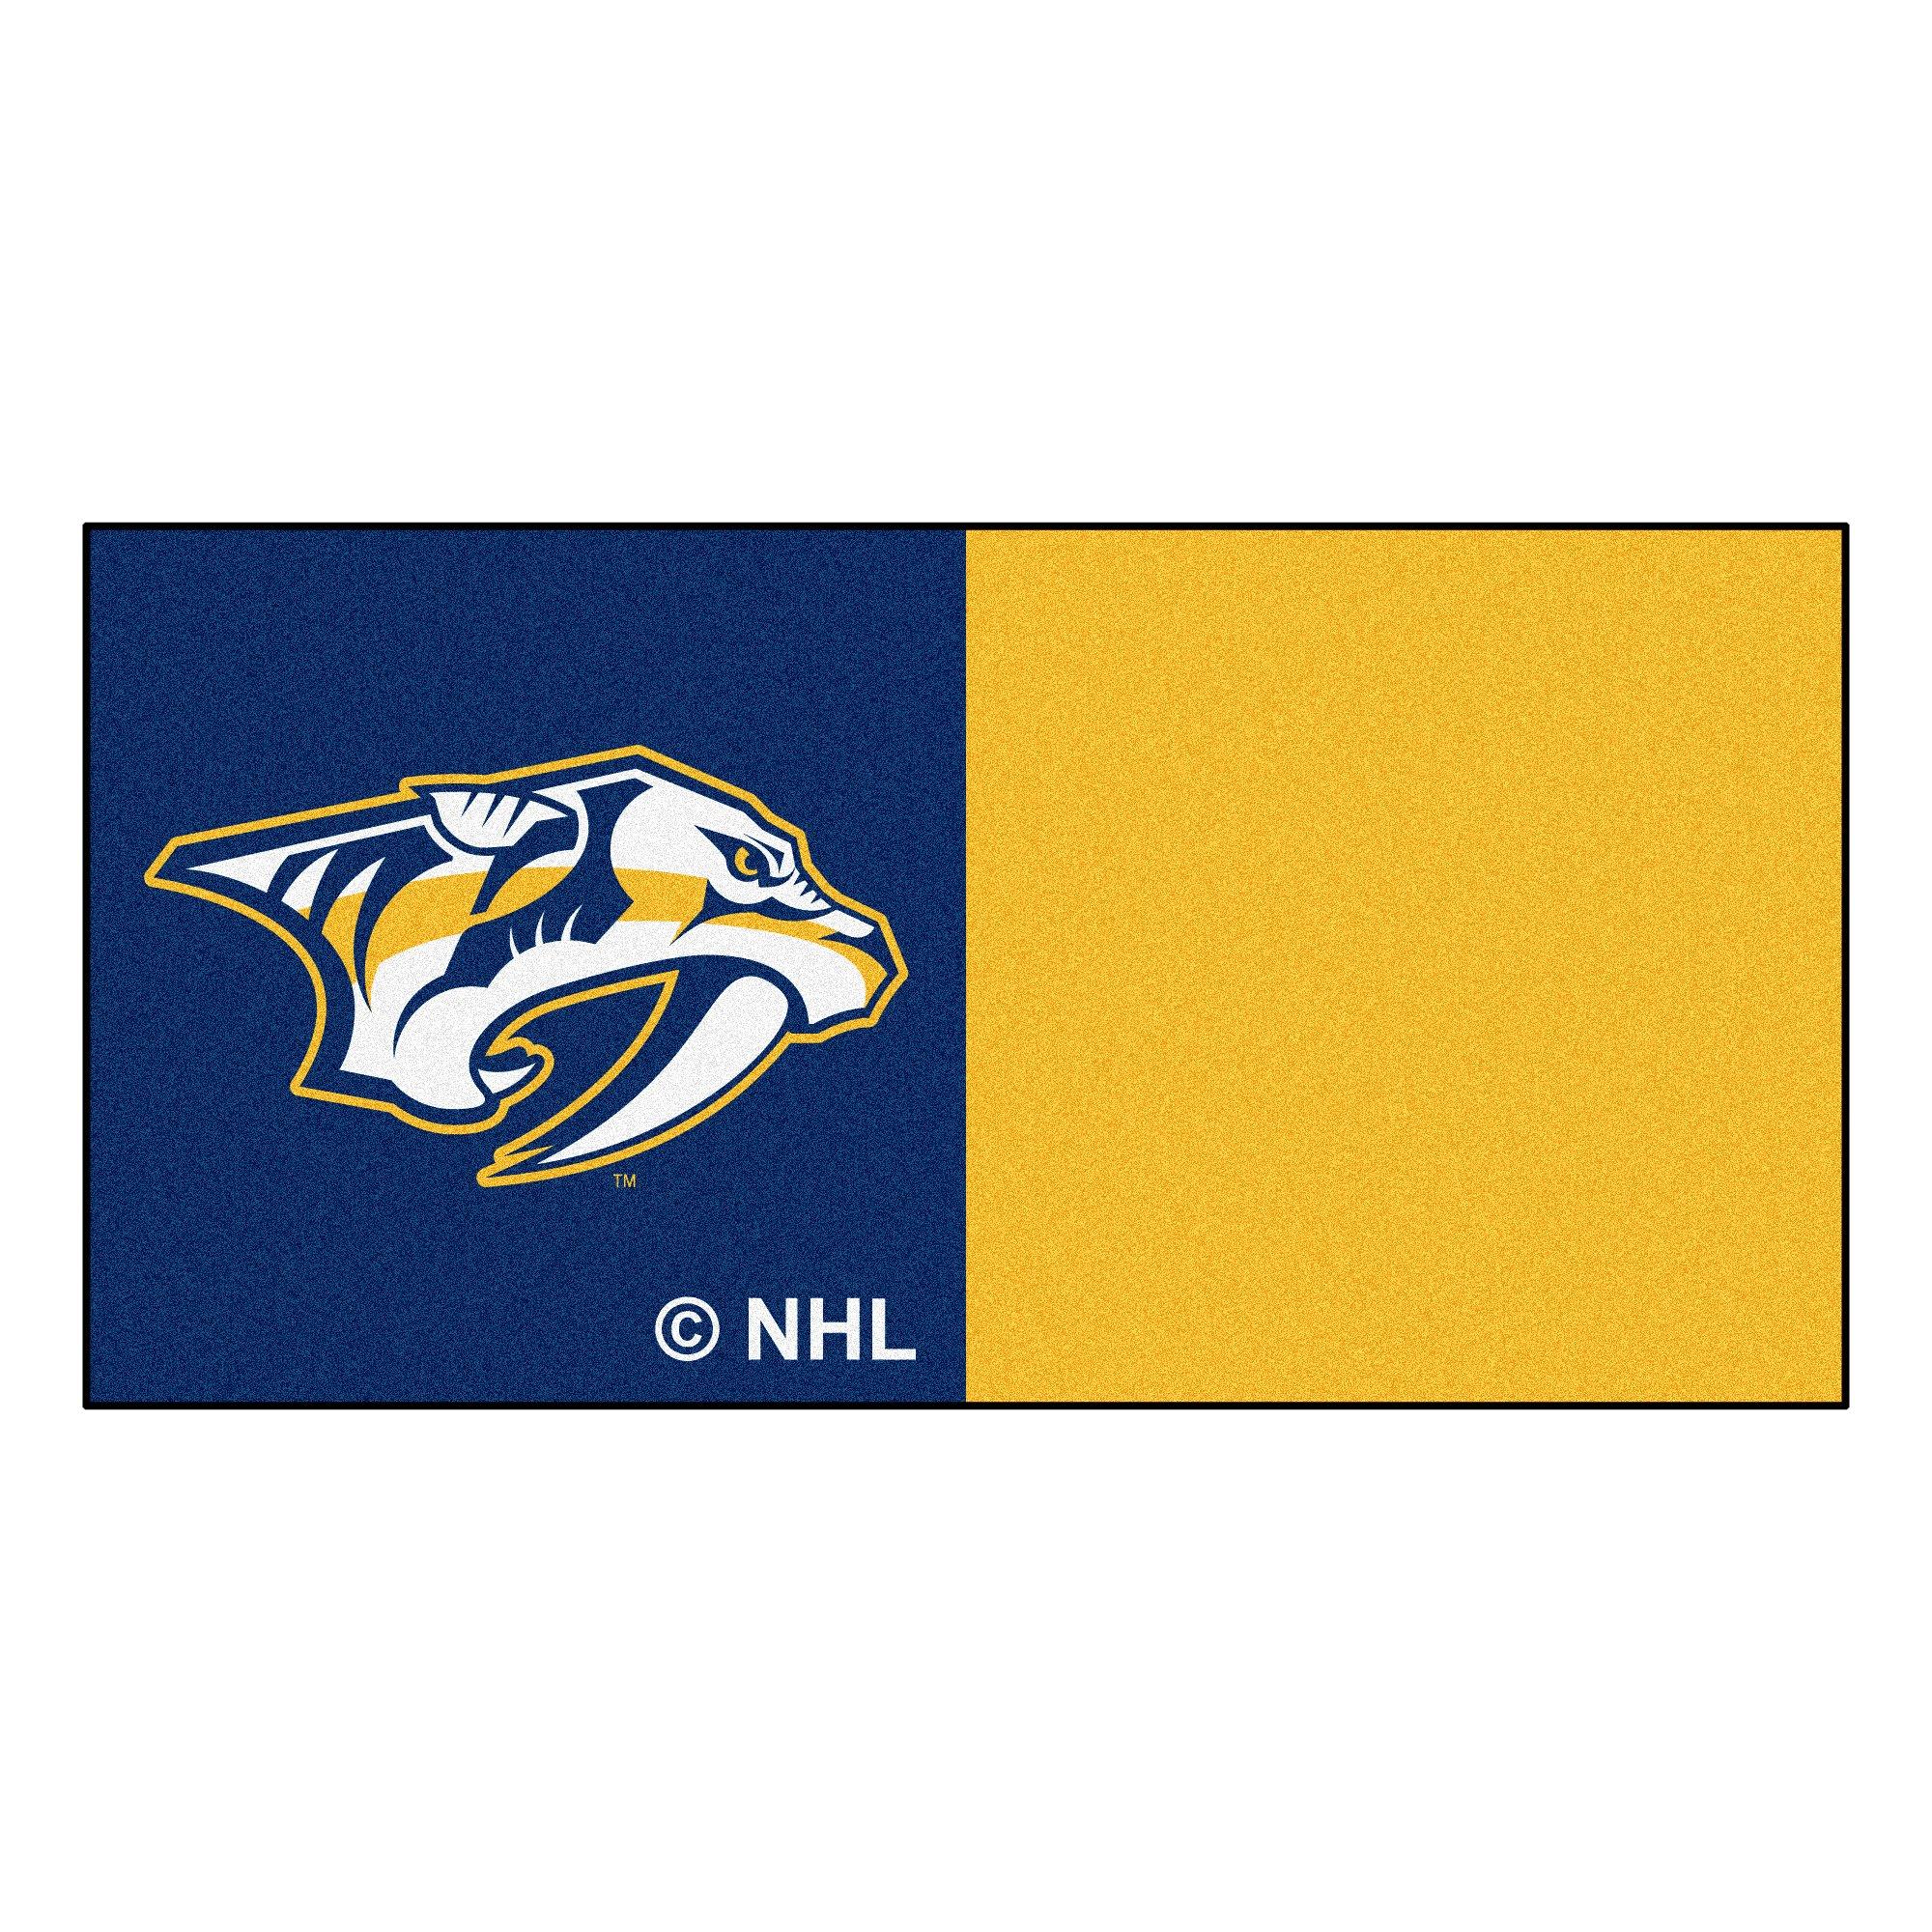 FANMATS NHL Nashville Predators Nylon Face Team Carpet Tiles by Fanmats